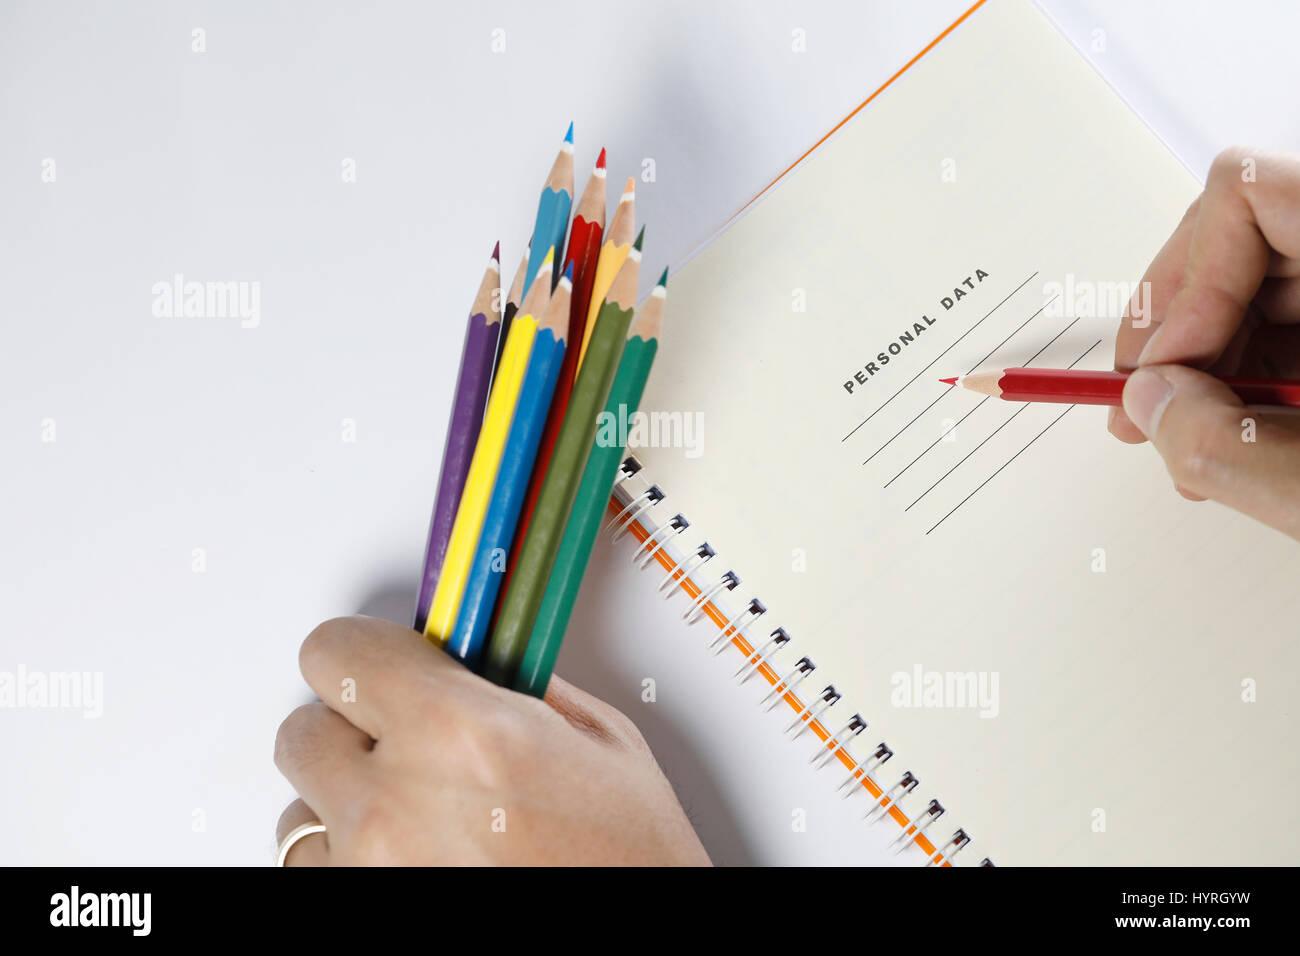 Pencil writting on notebook on white background - Stock Image